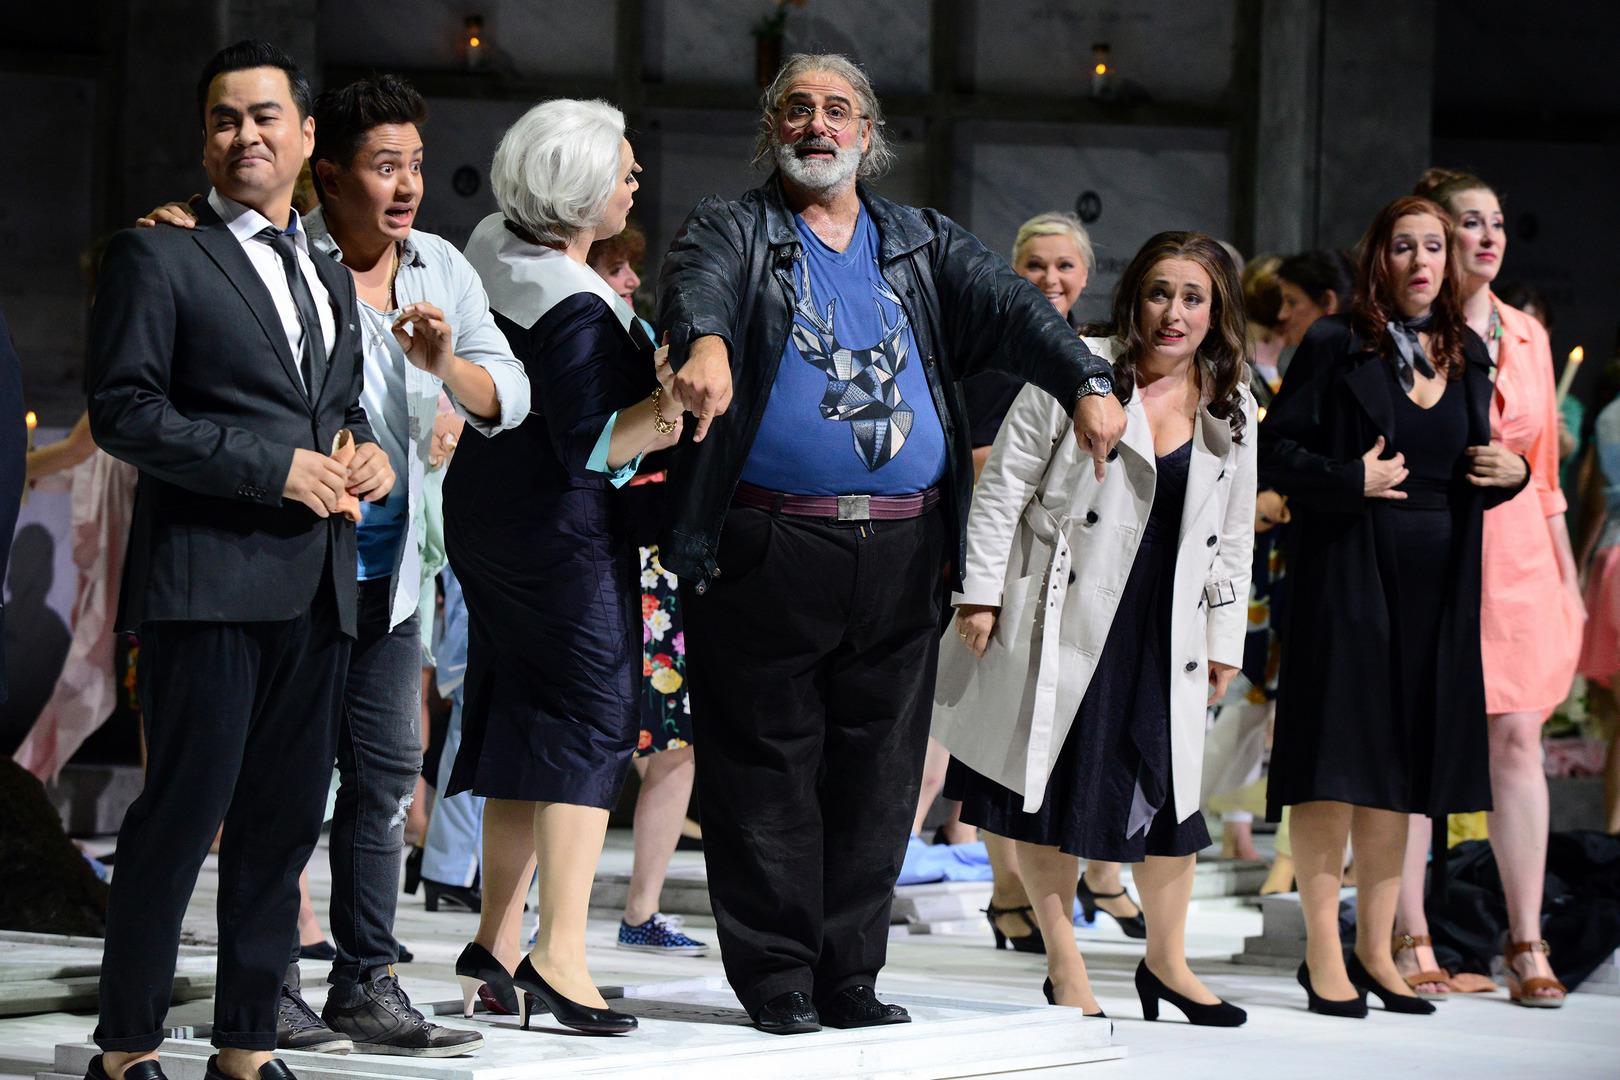 Falstaff-Opera-by-Giuseppe-Verdi-directed-by-Jacopo-Spirei- in-Karlsruhe-12